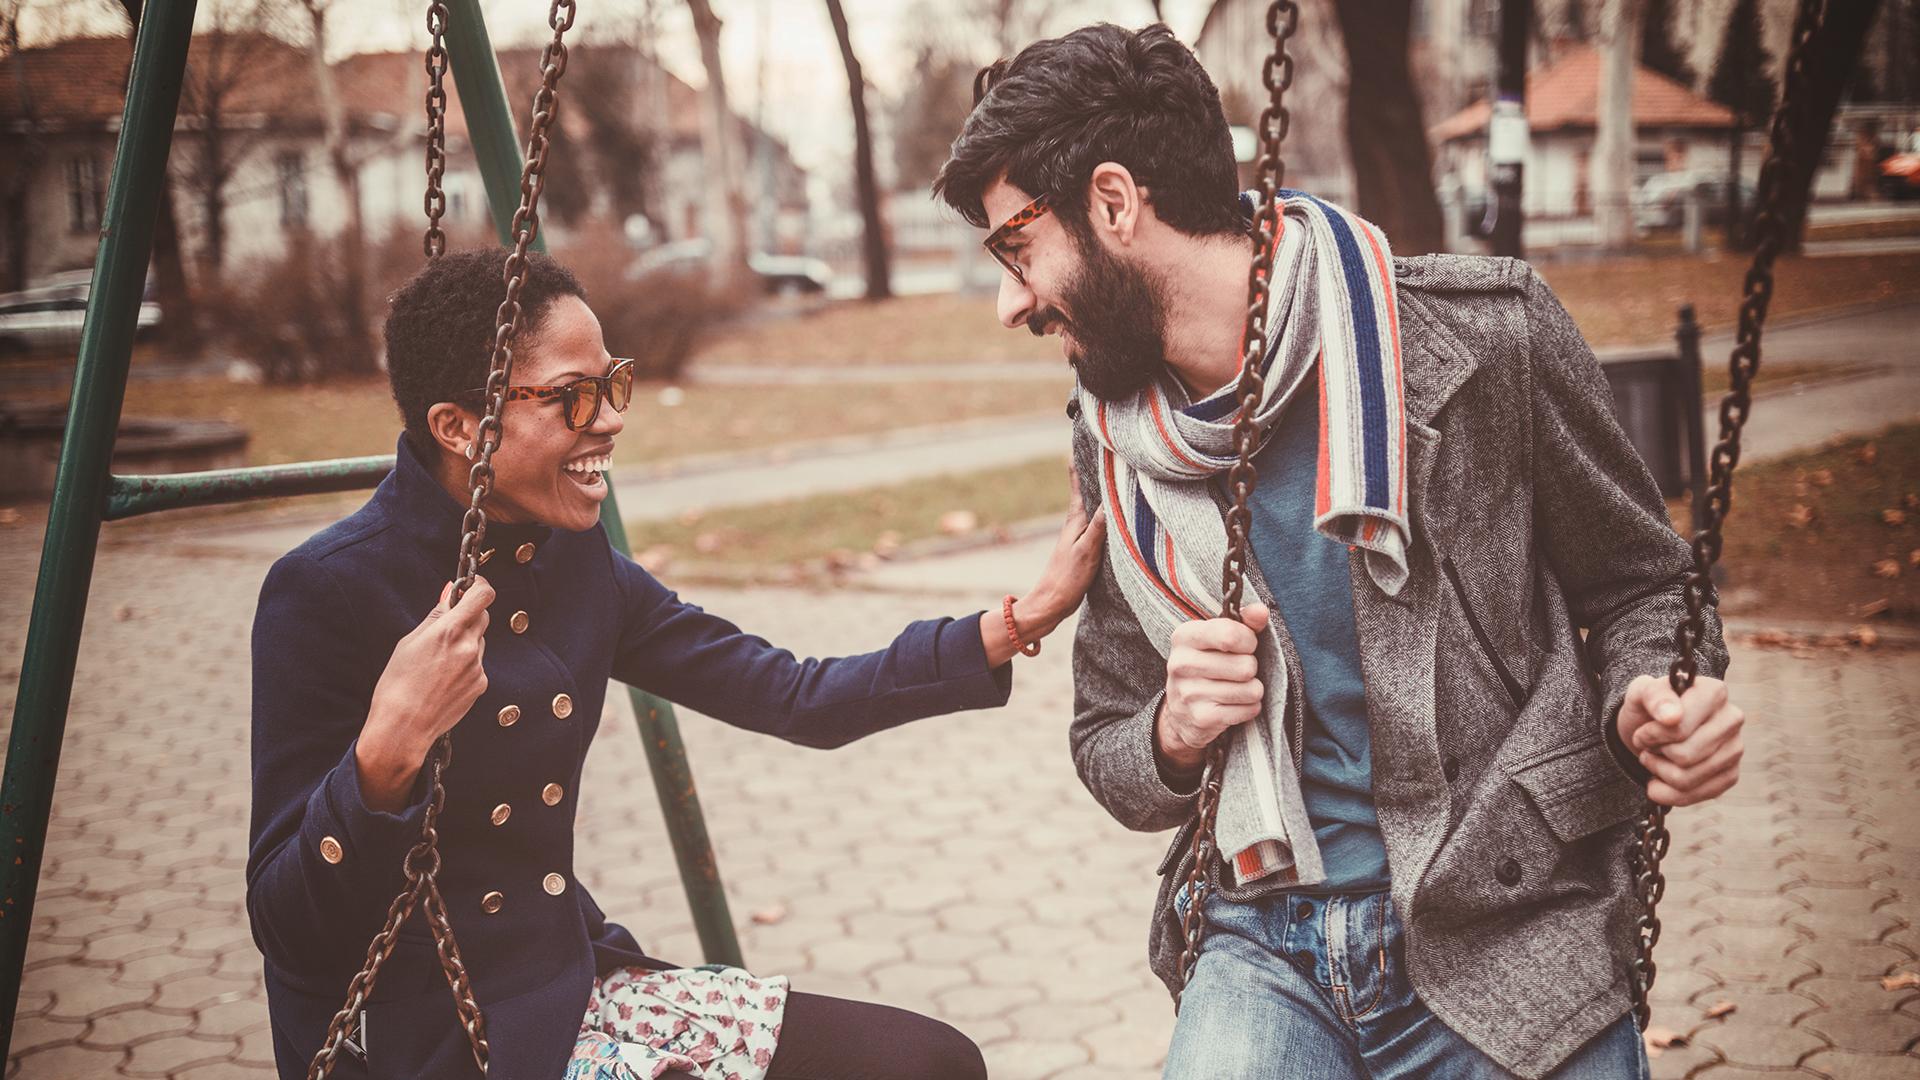 8 Ways to Make Dating Fun Again